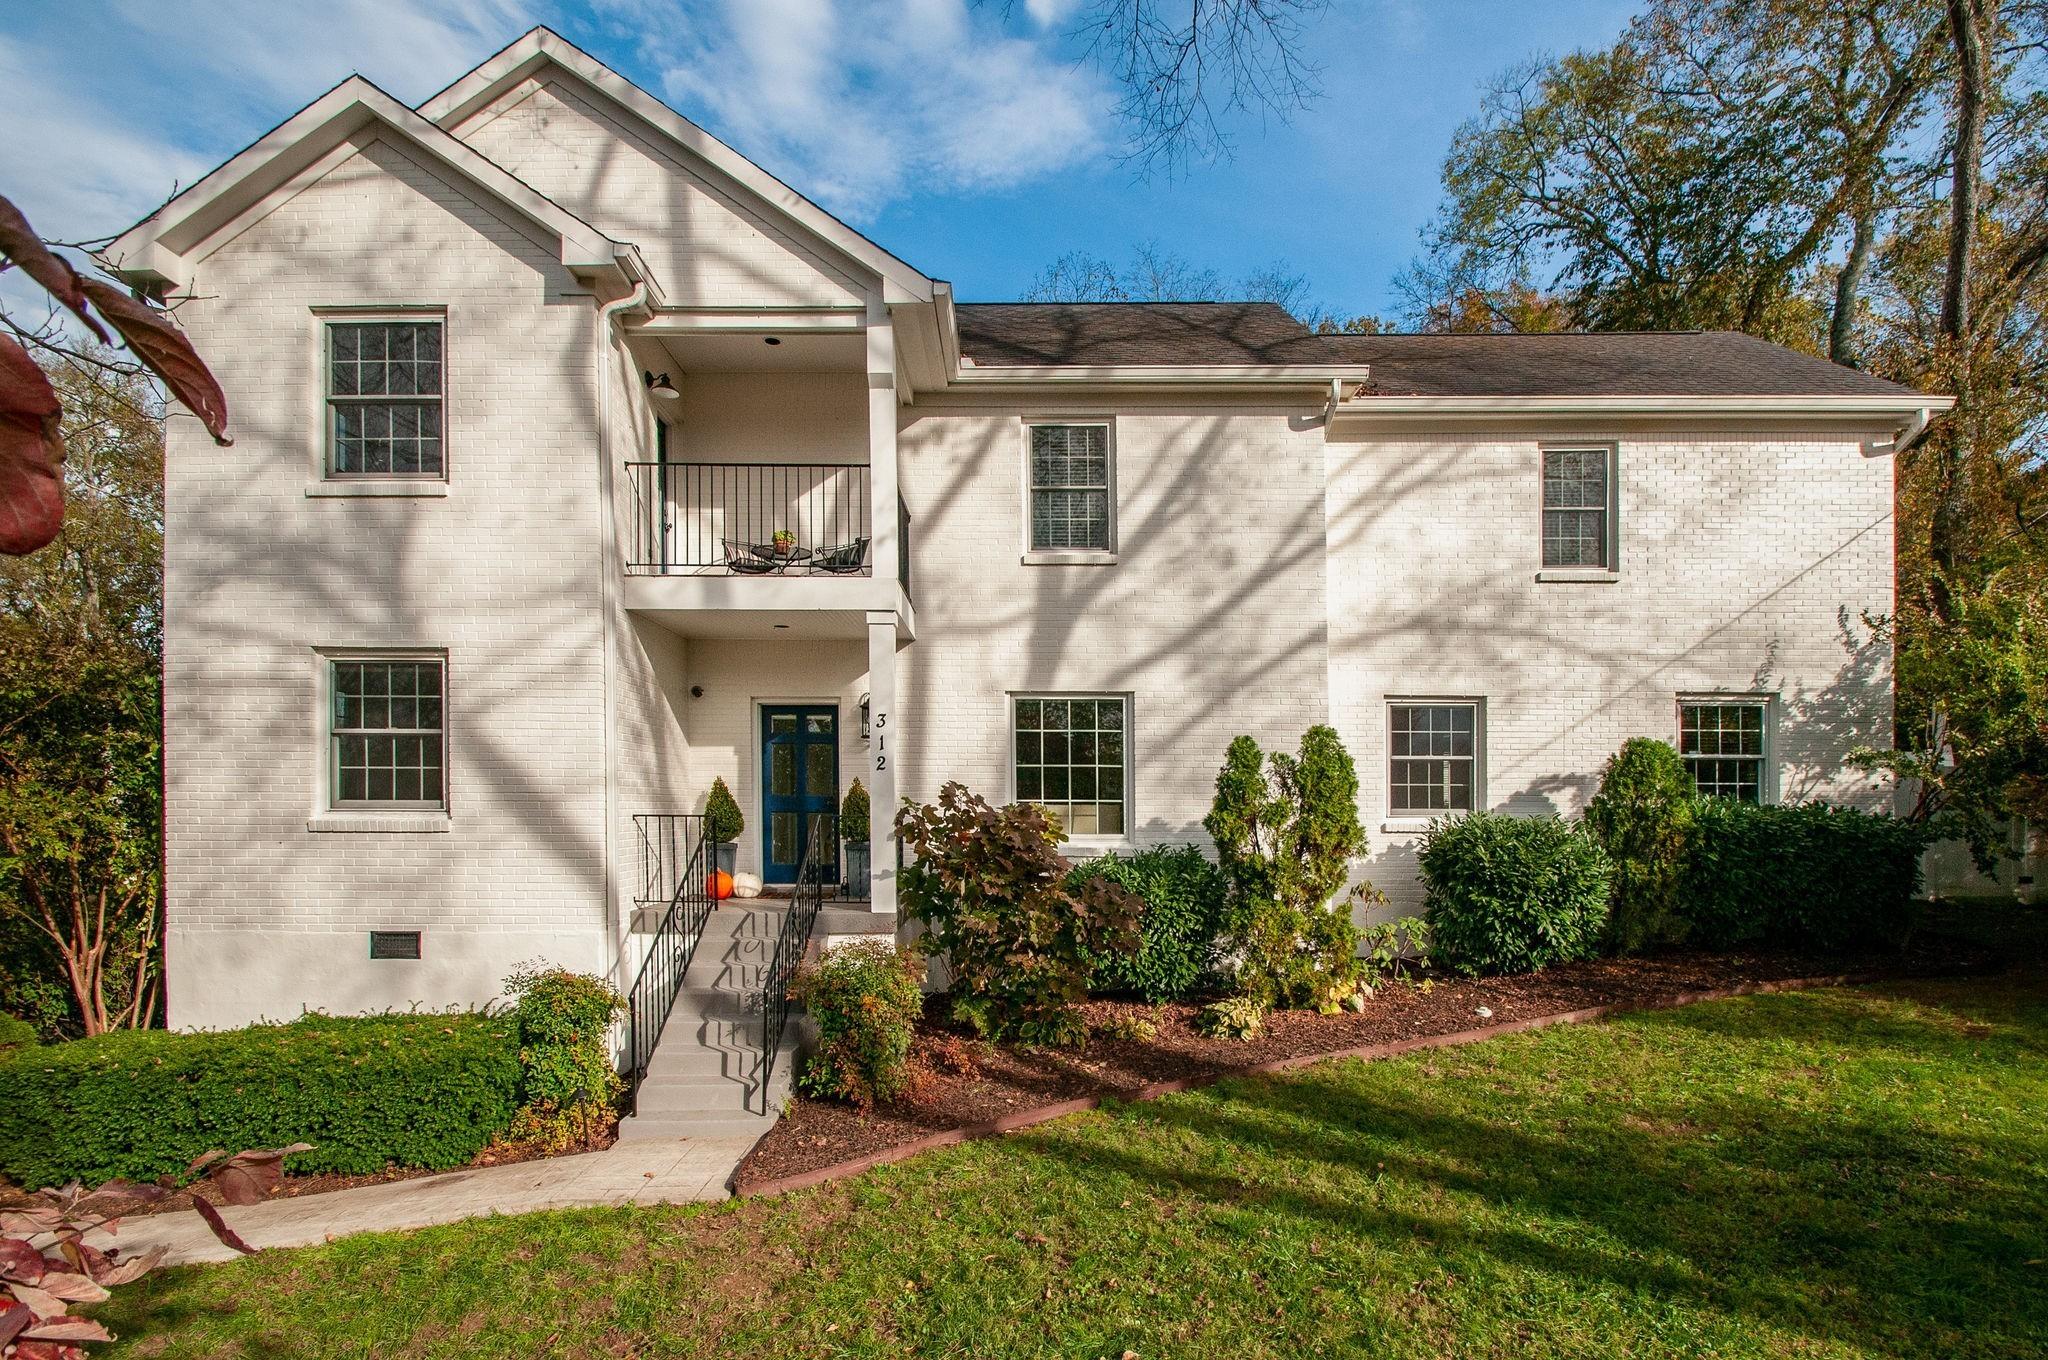 312 S Wilson Blvd Property Photo - Nashville, TN real estate listing